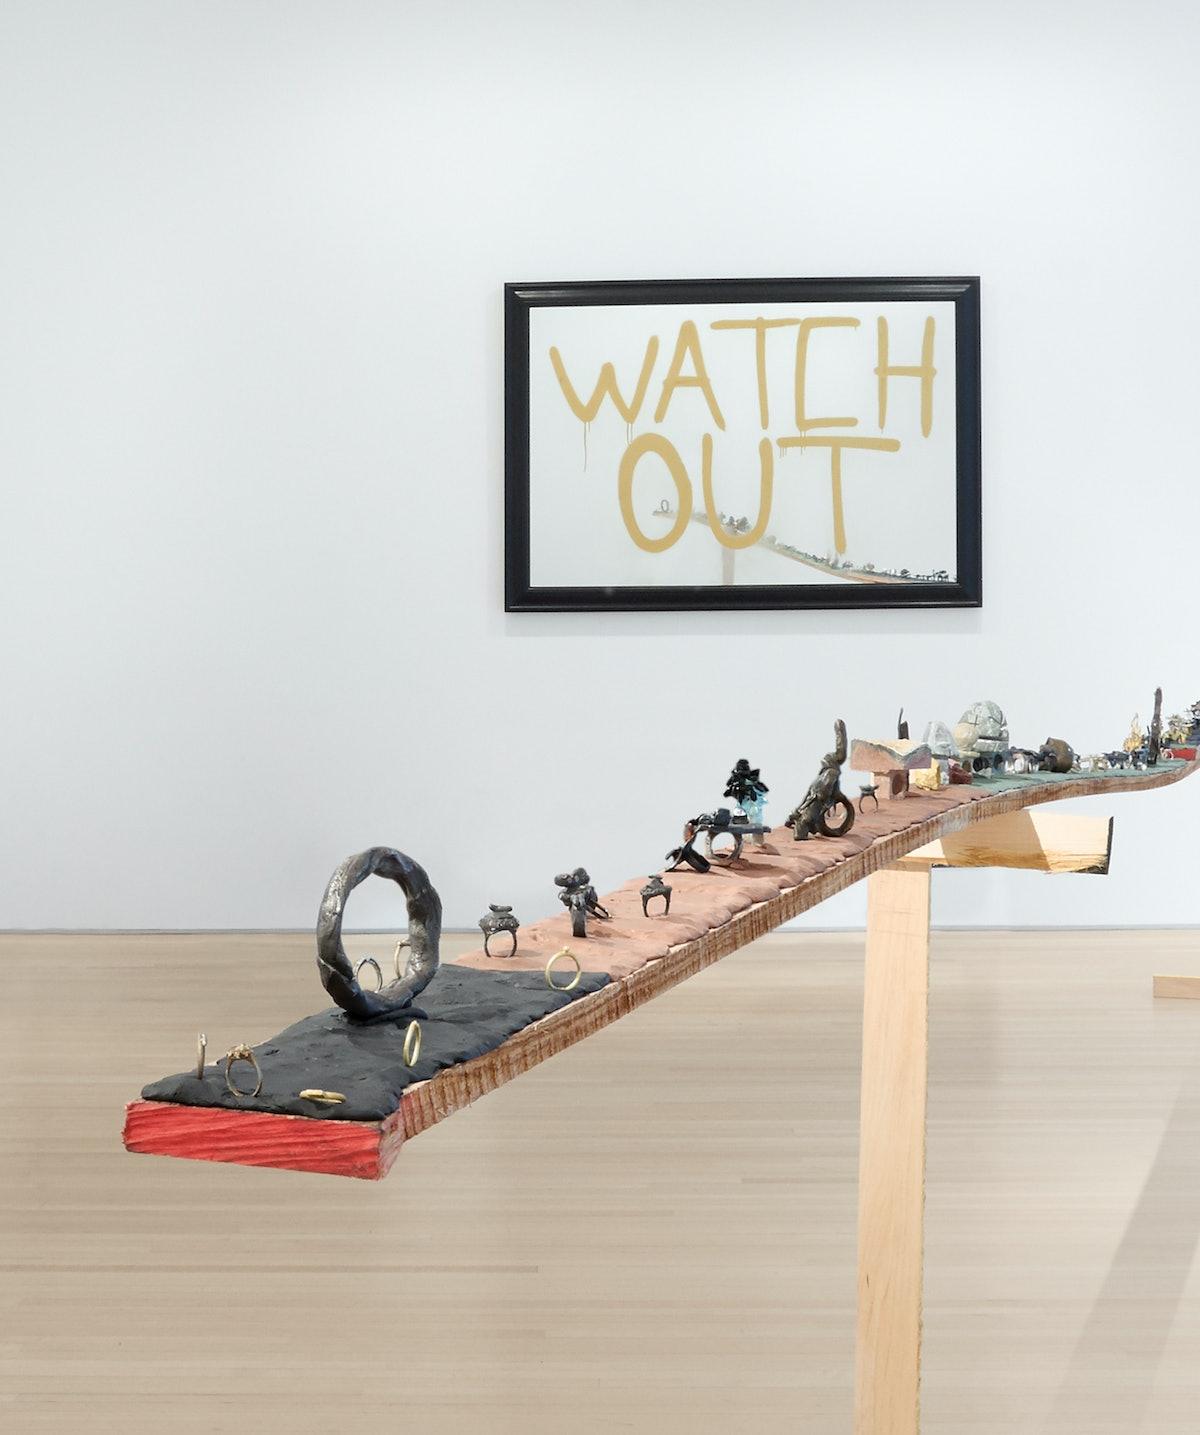 Installation view of Karl Fritsch at Salon 94